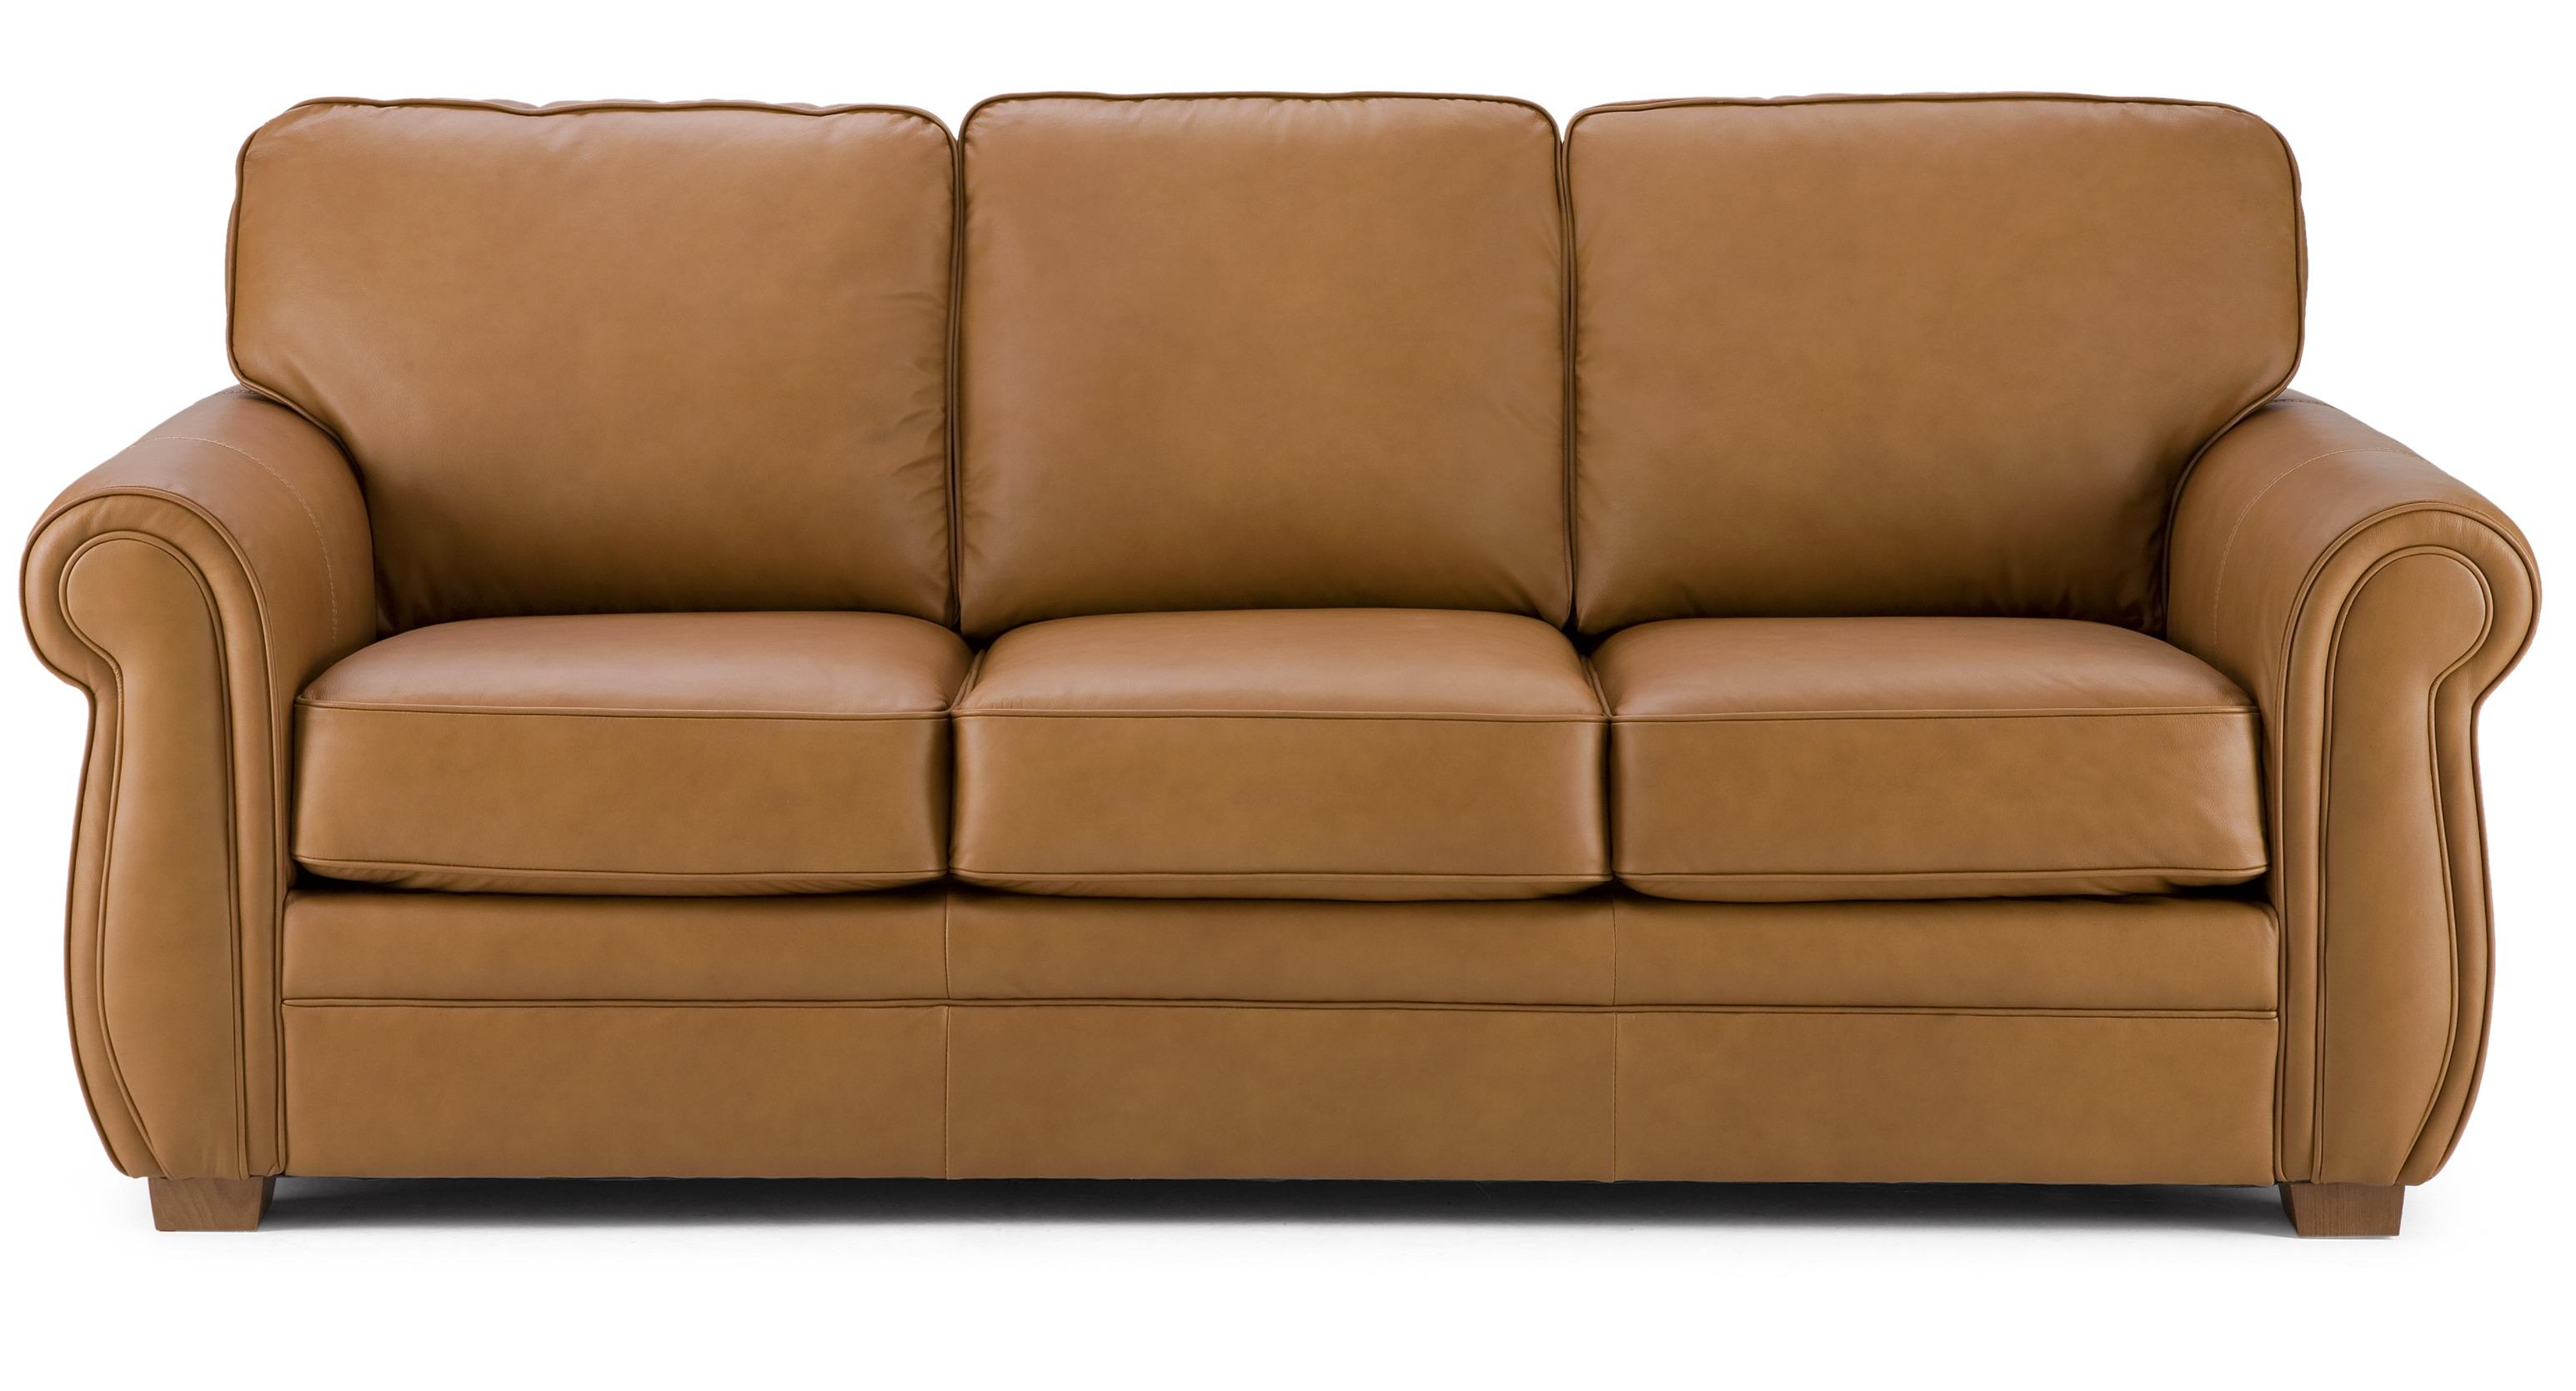 Awesome Palliser Furniture Viceroy Fabric Sectional sofa